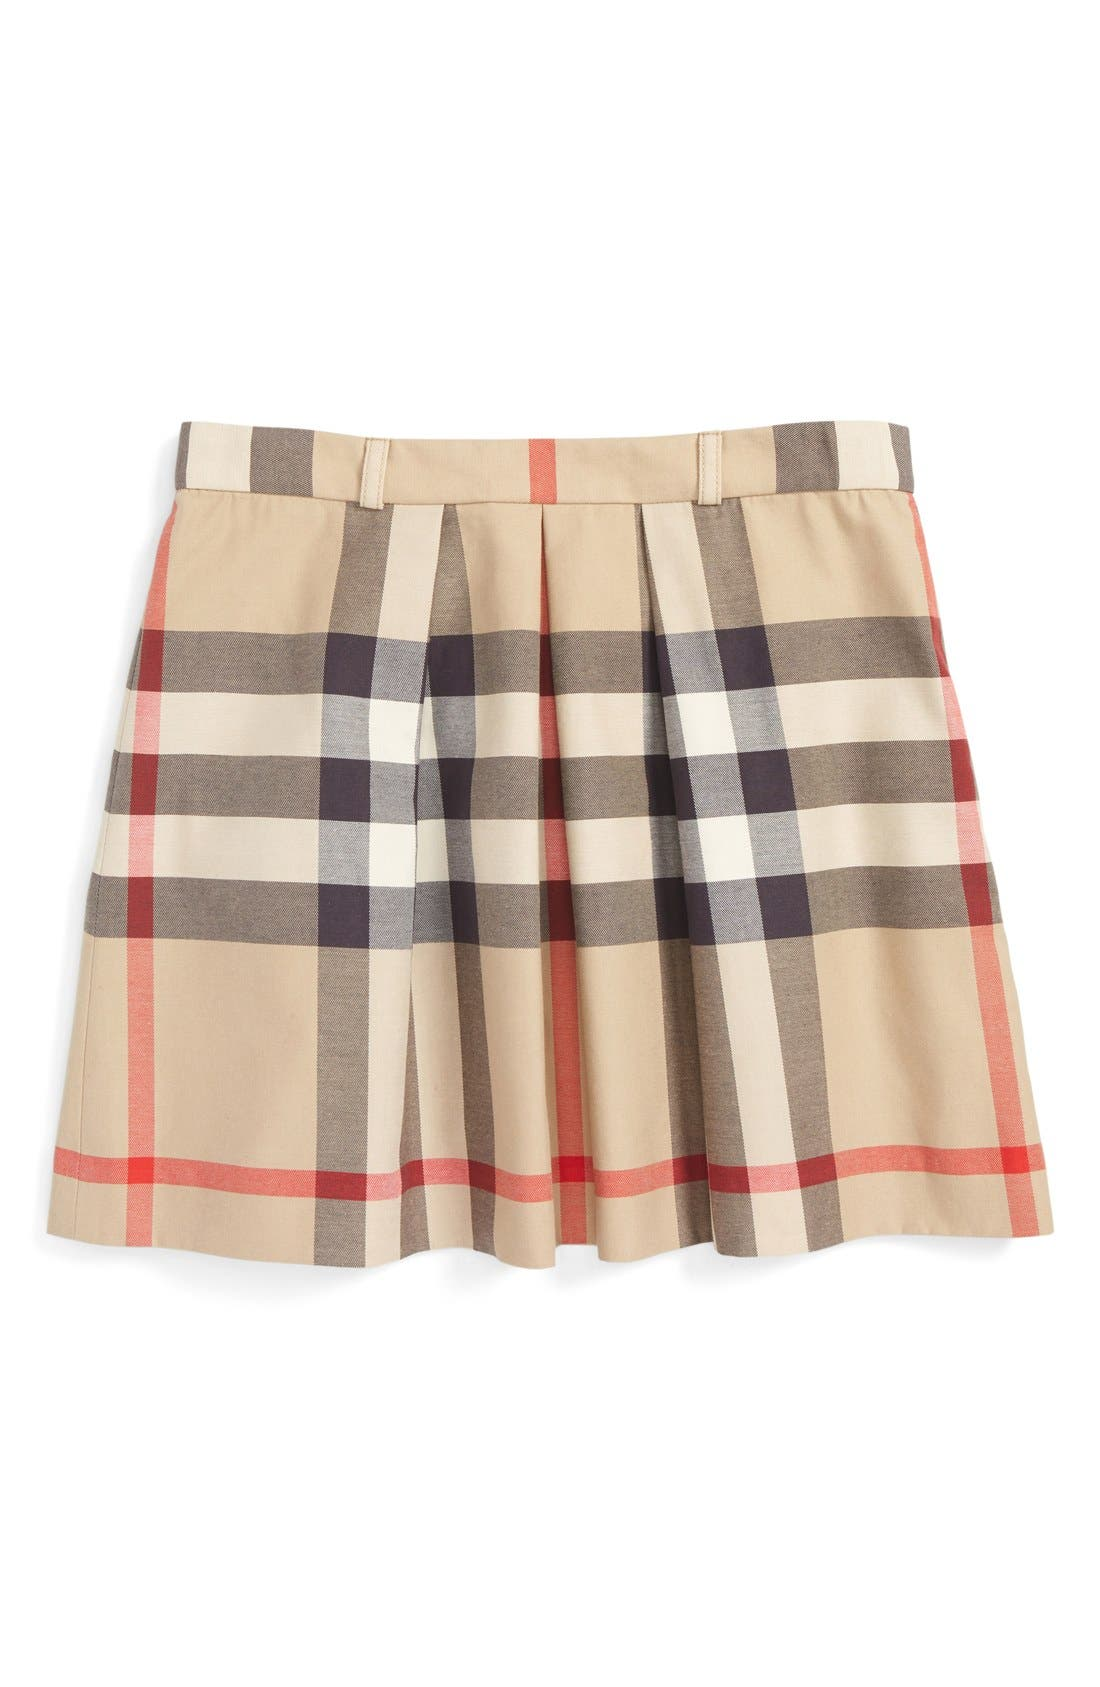 Alternate Image 1 Selected - Burberry Pleated Check Skirt (Little Girls & Big Girls)